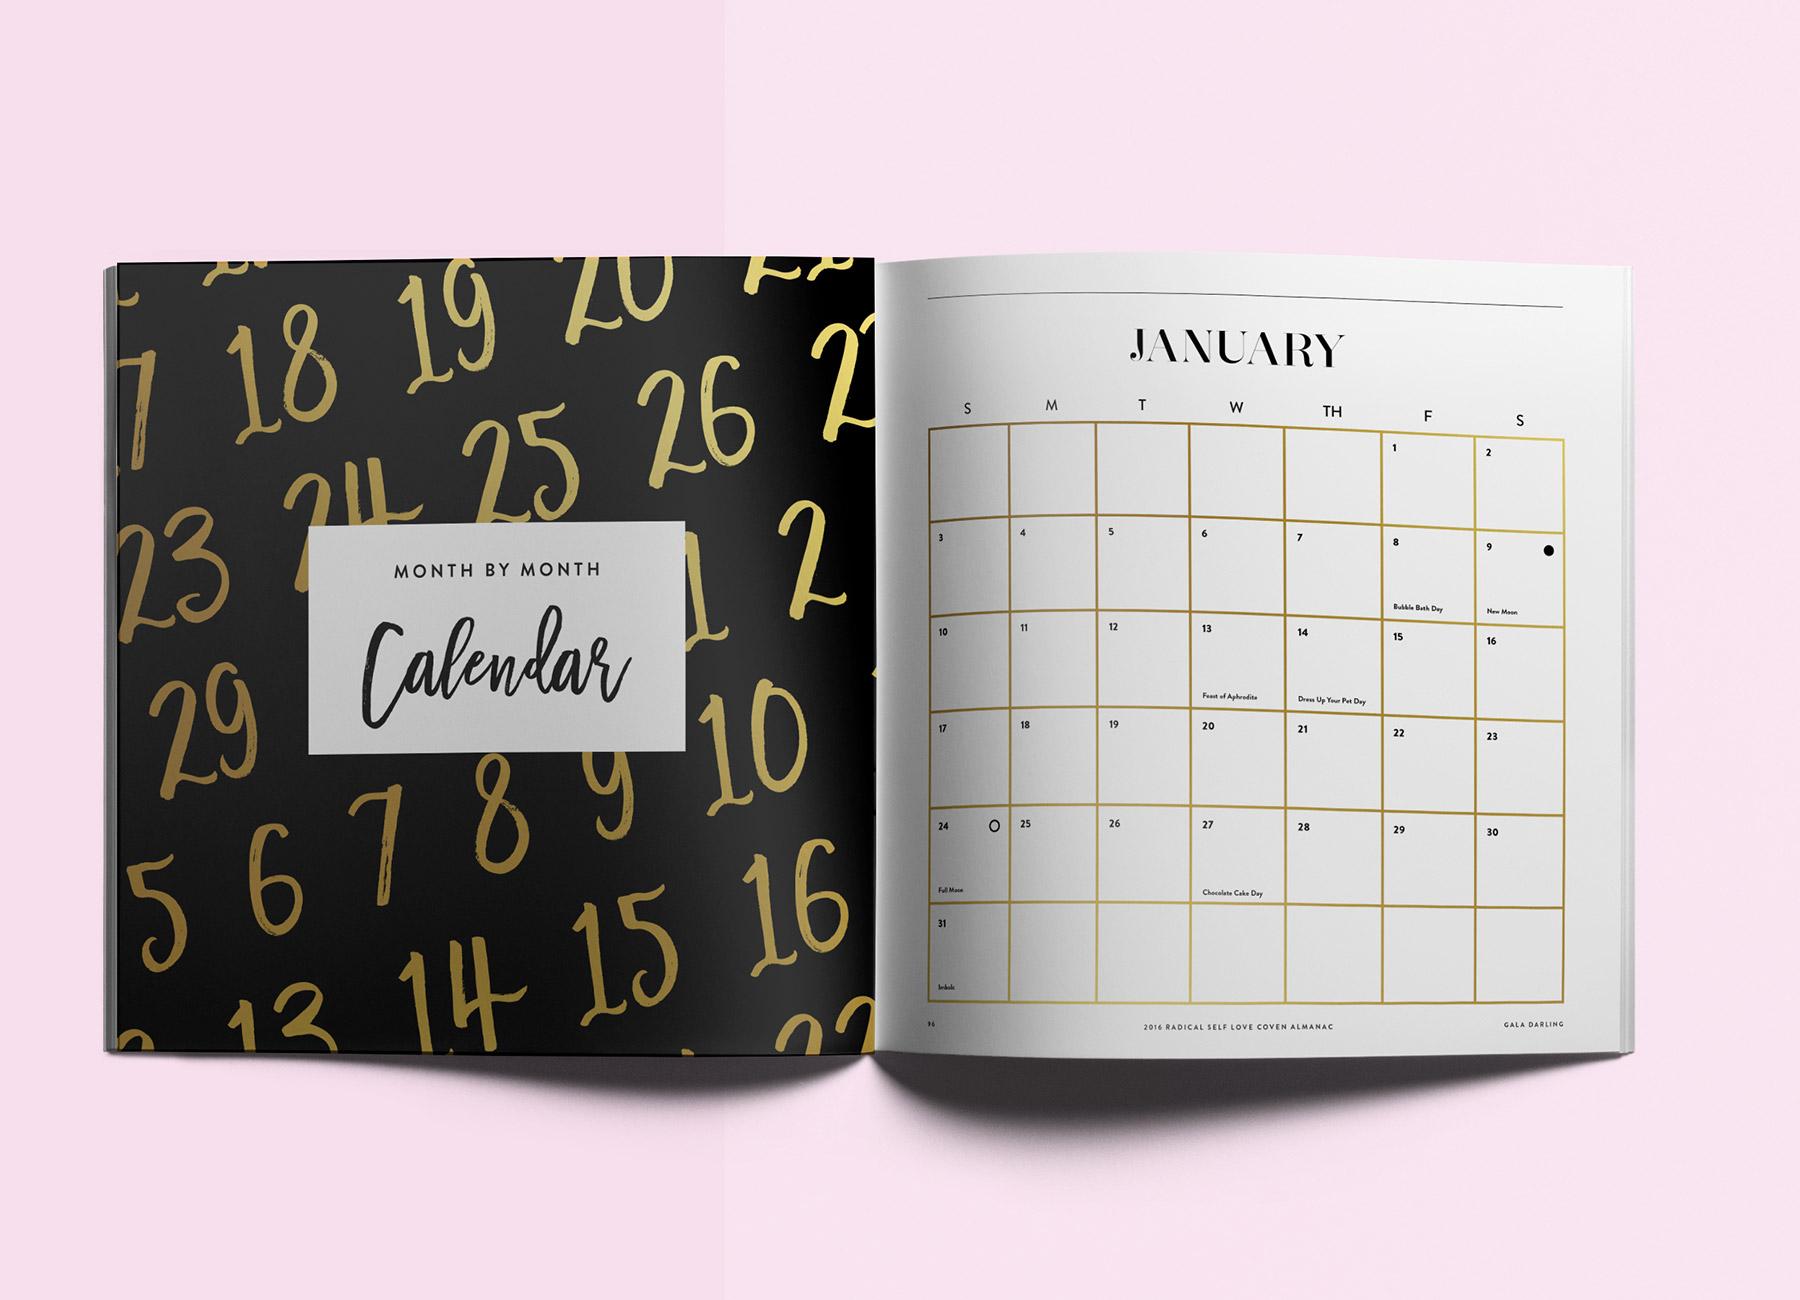 Gala Darling | Gala Darling RSL Coven Almanac